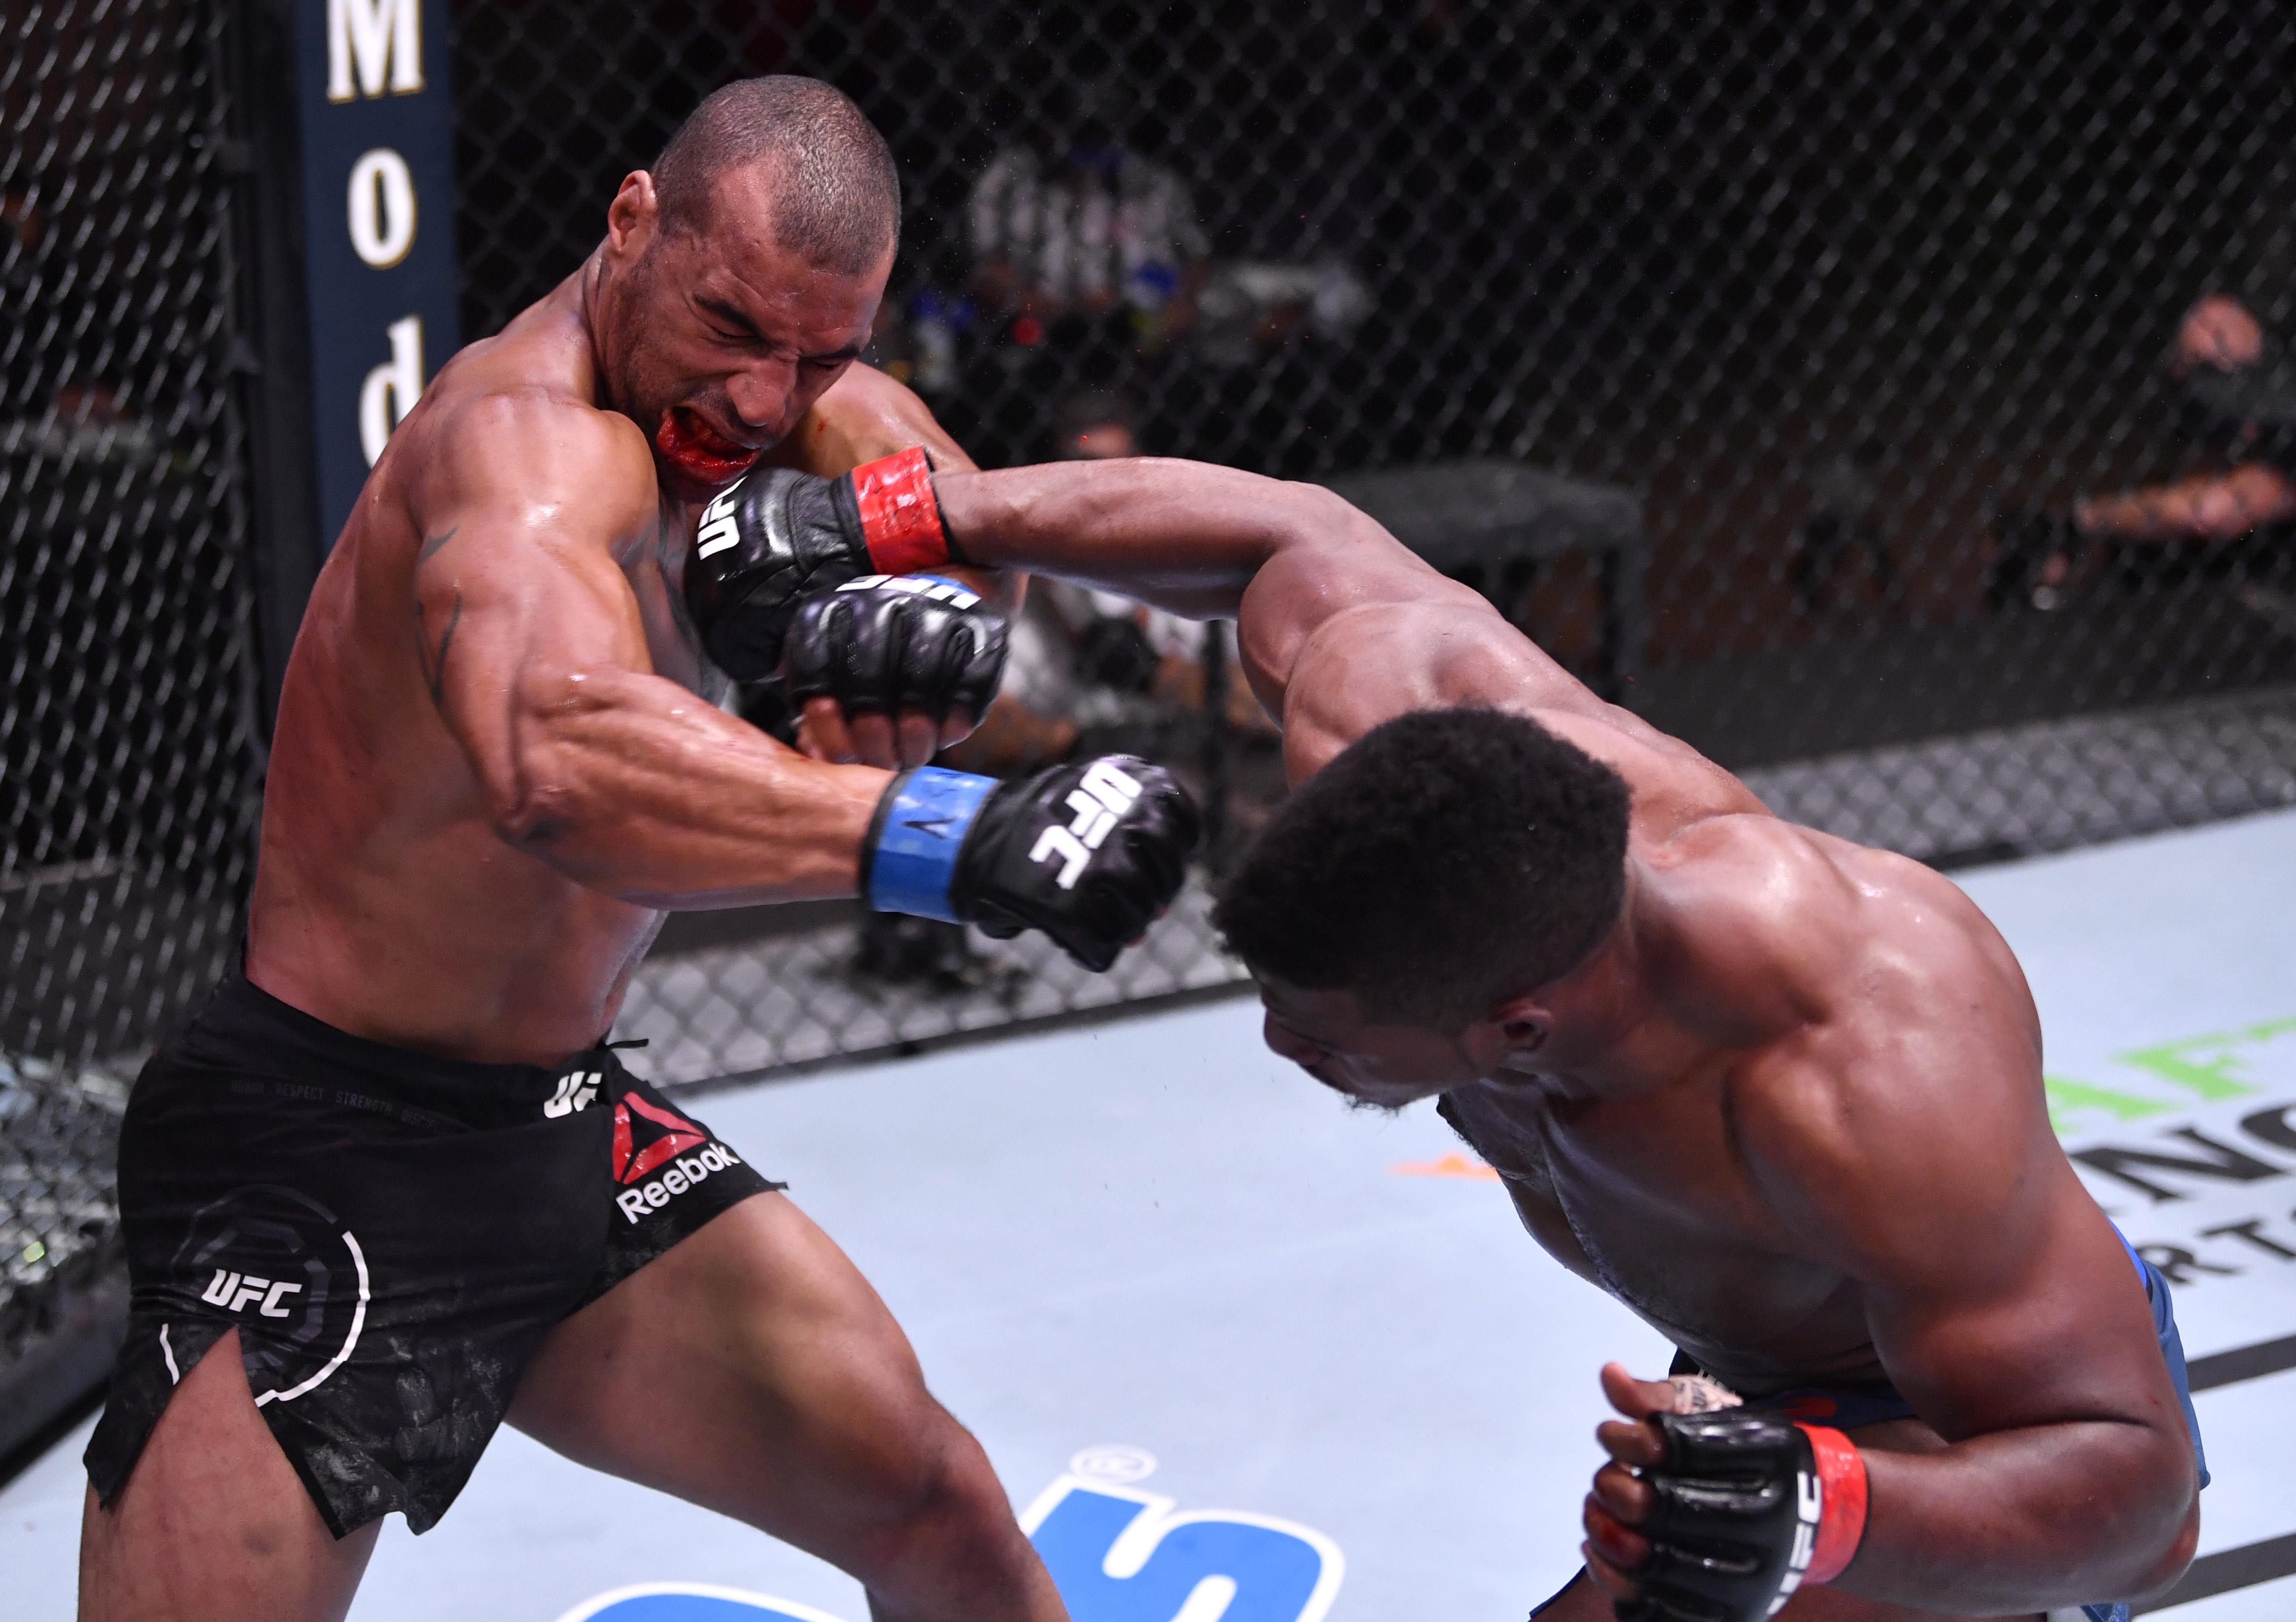 UFC 250: Menifield v Clark